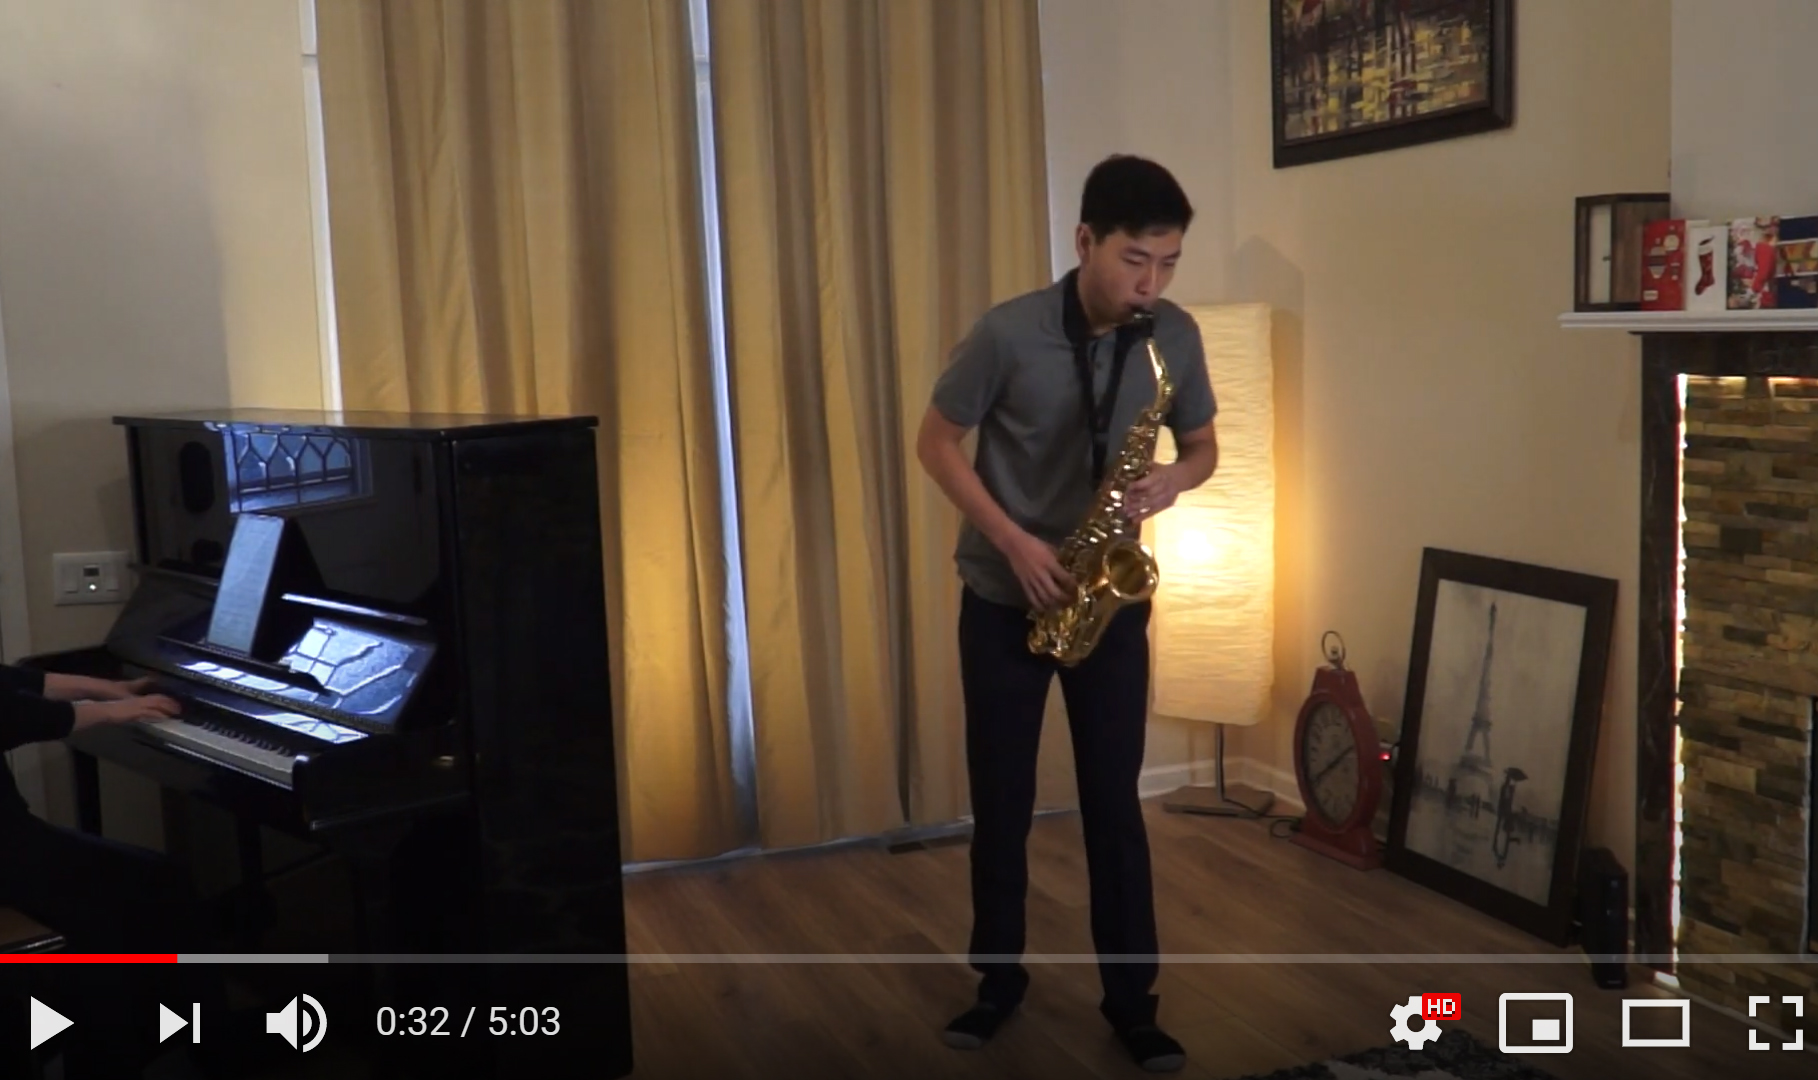 (58d) Glazunov: Saxophone Concerto Op.109 – Mvt. 1 (Allegro Moderato) – Justin Chung